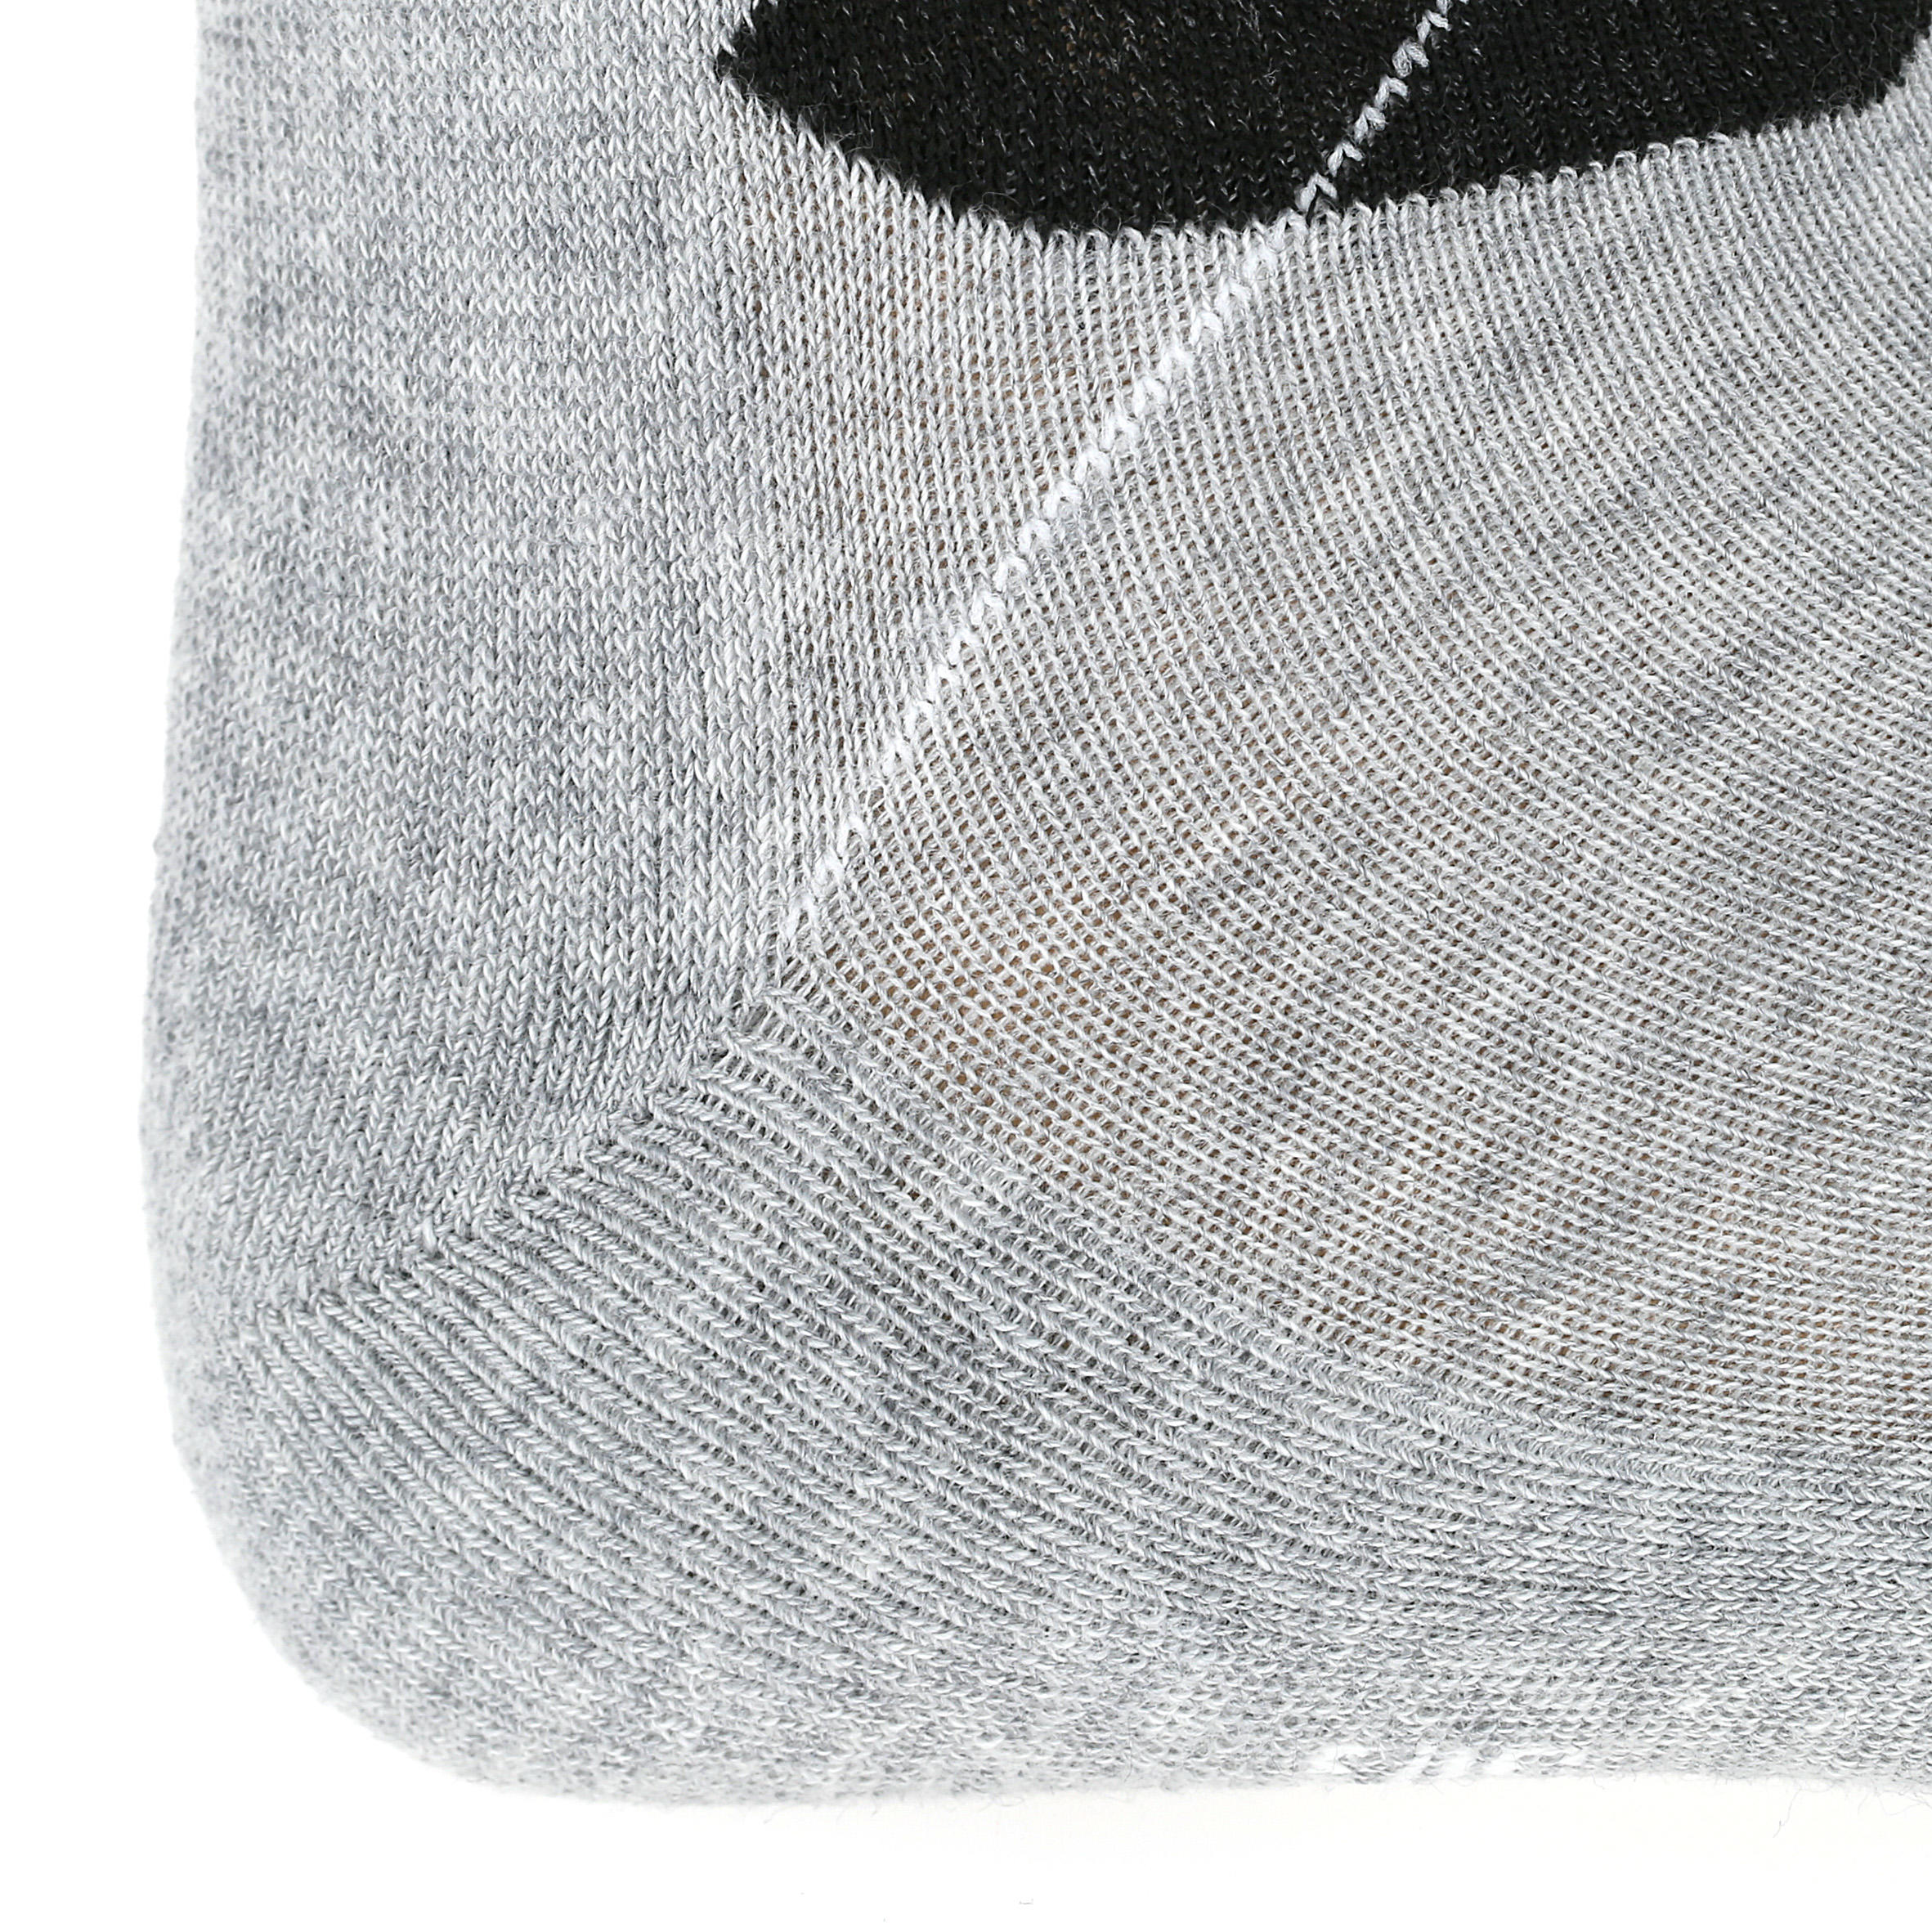 Adult Horseback Riding Argyle Socks 2-Pair - Grey/Black